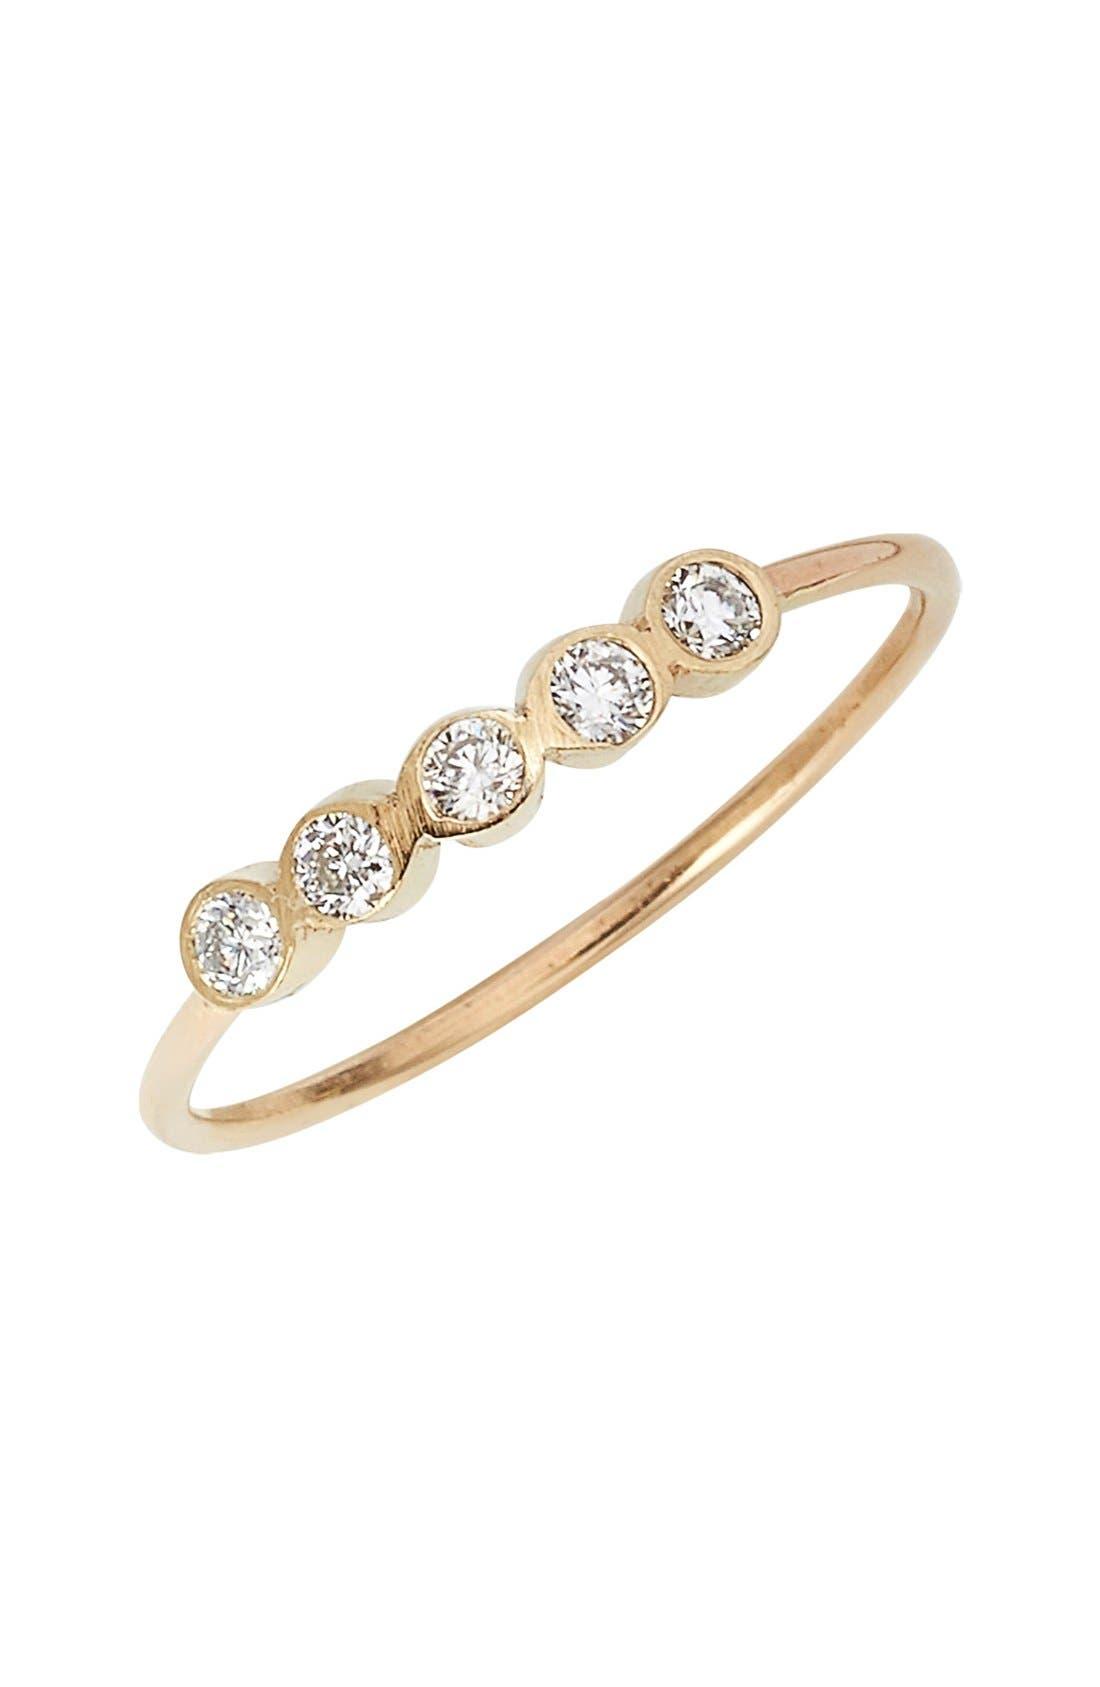 Main Image - Zoë Chicco Diamond Bezel Ring